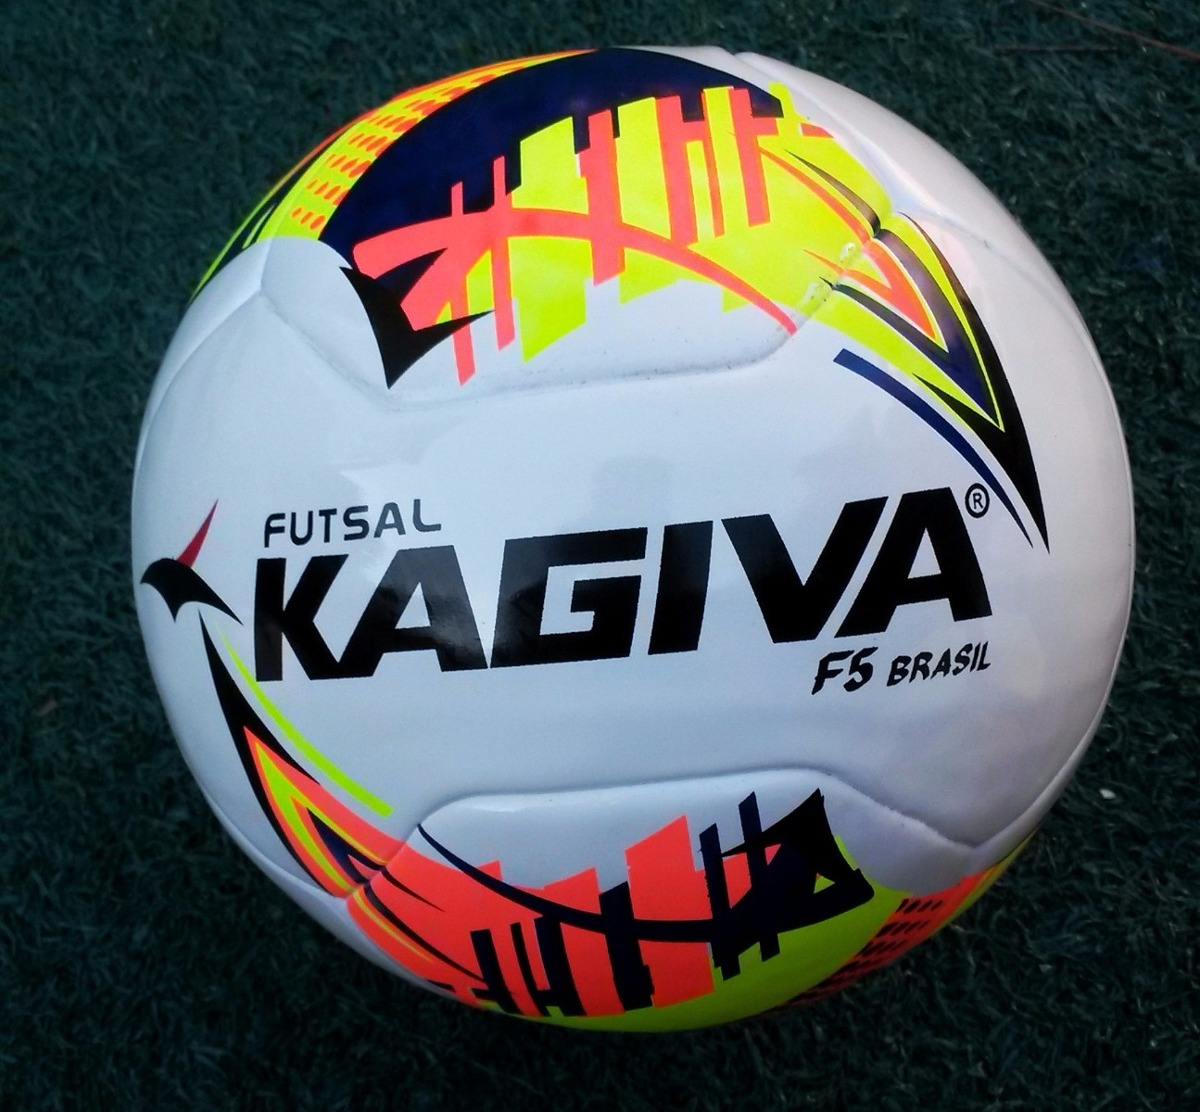 ... f5 brasil pro frete gratis 2017 · bola futsal kagiva. Carregando zoom. 80fd63101948d